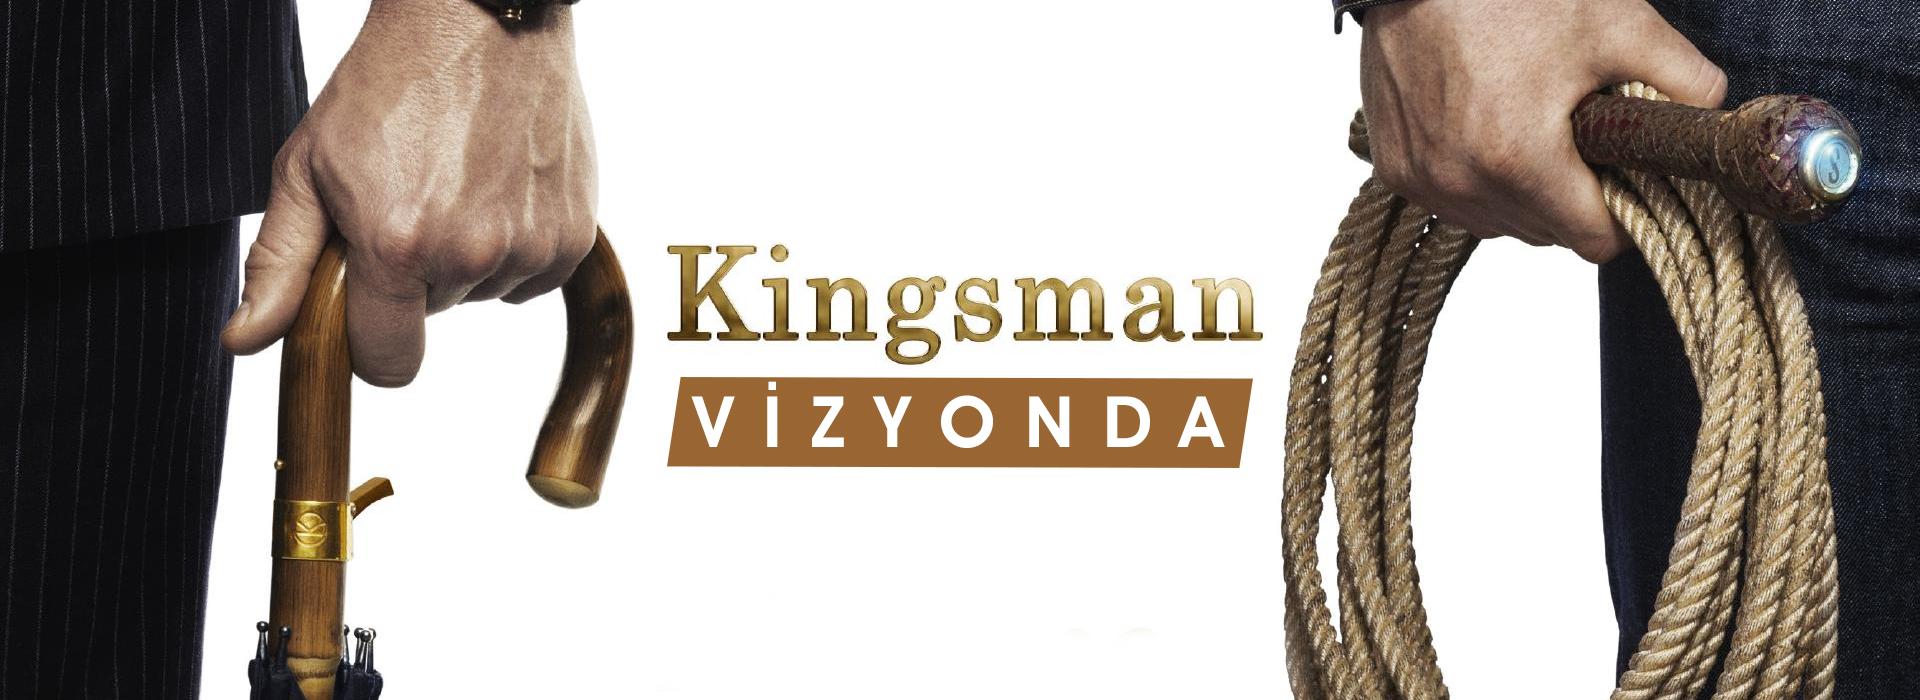 kingsman-slide